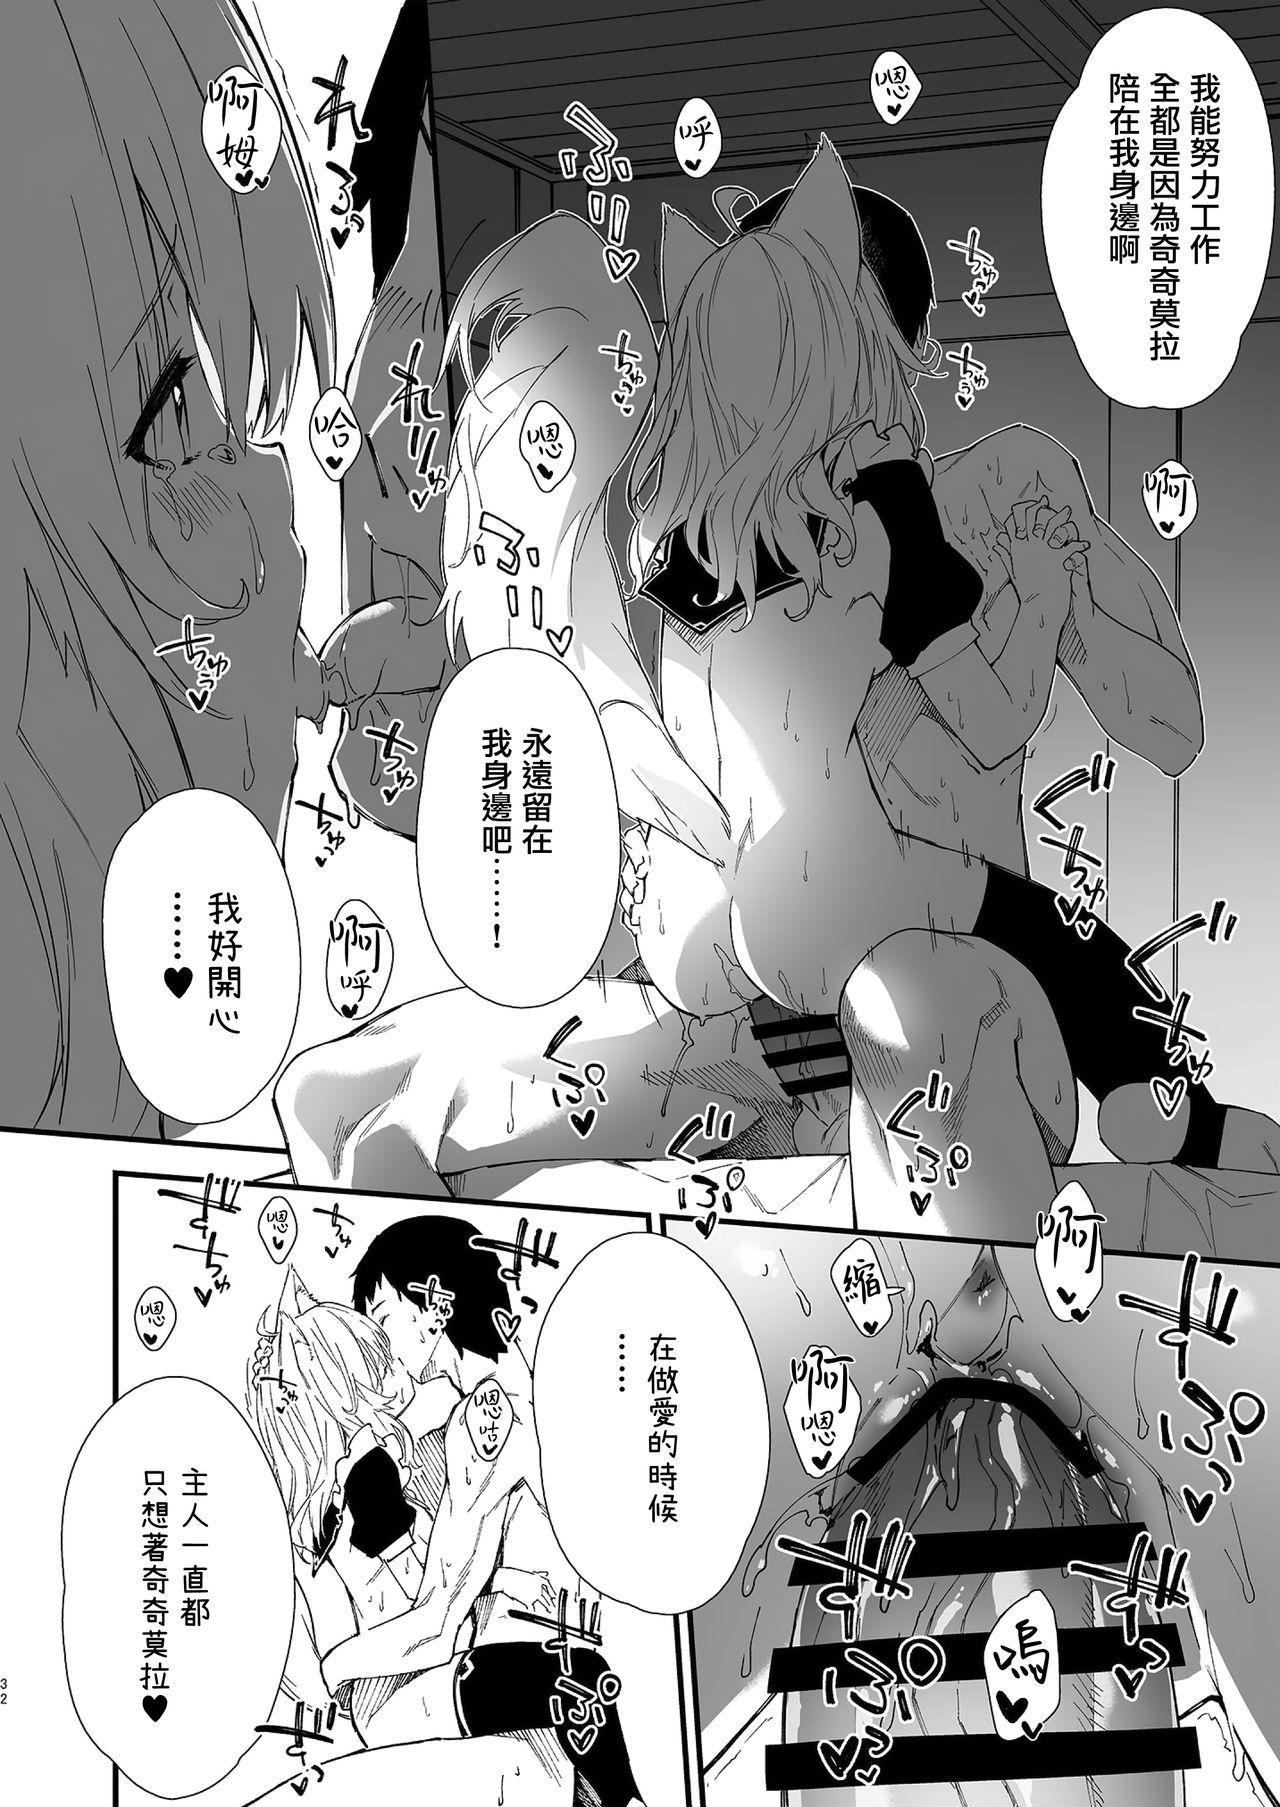 Kemomimi Maid to Ichaicha suru Hon 30